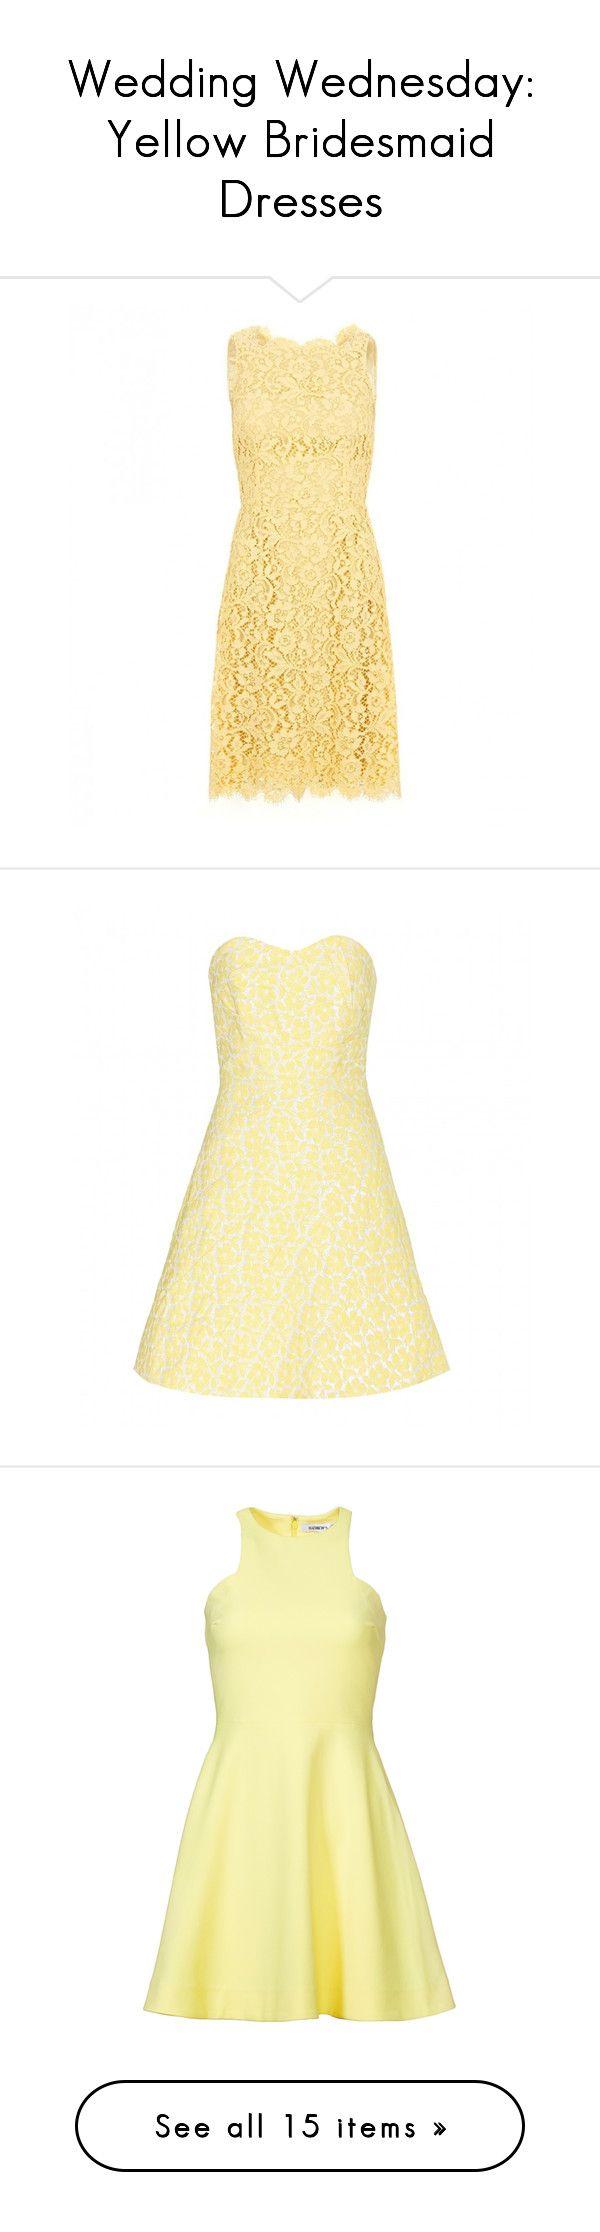 Wedding wednesday yellow bridesmaid dresses